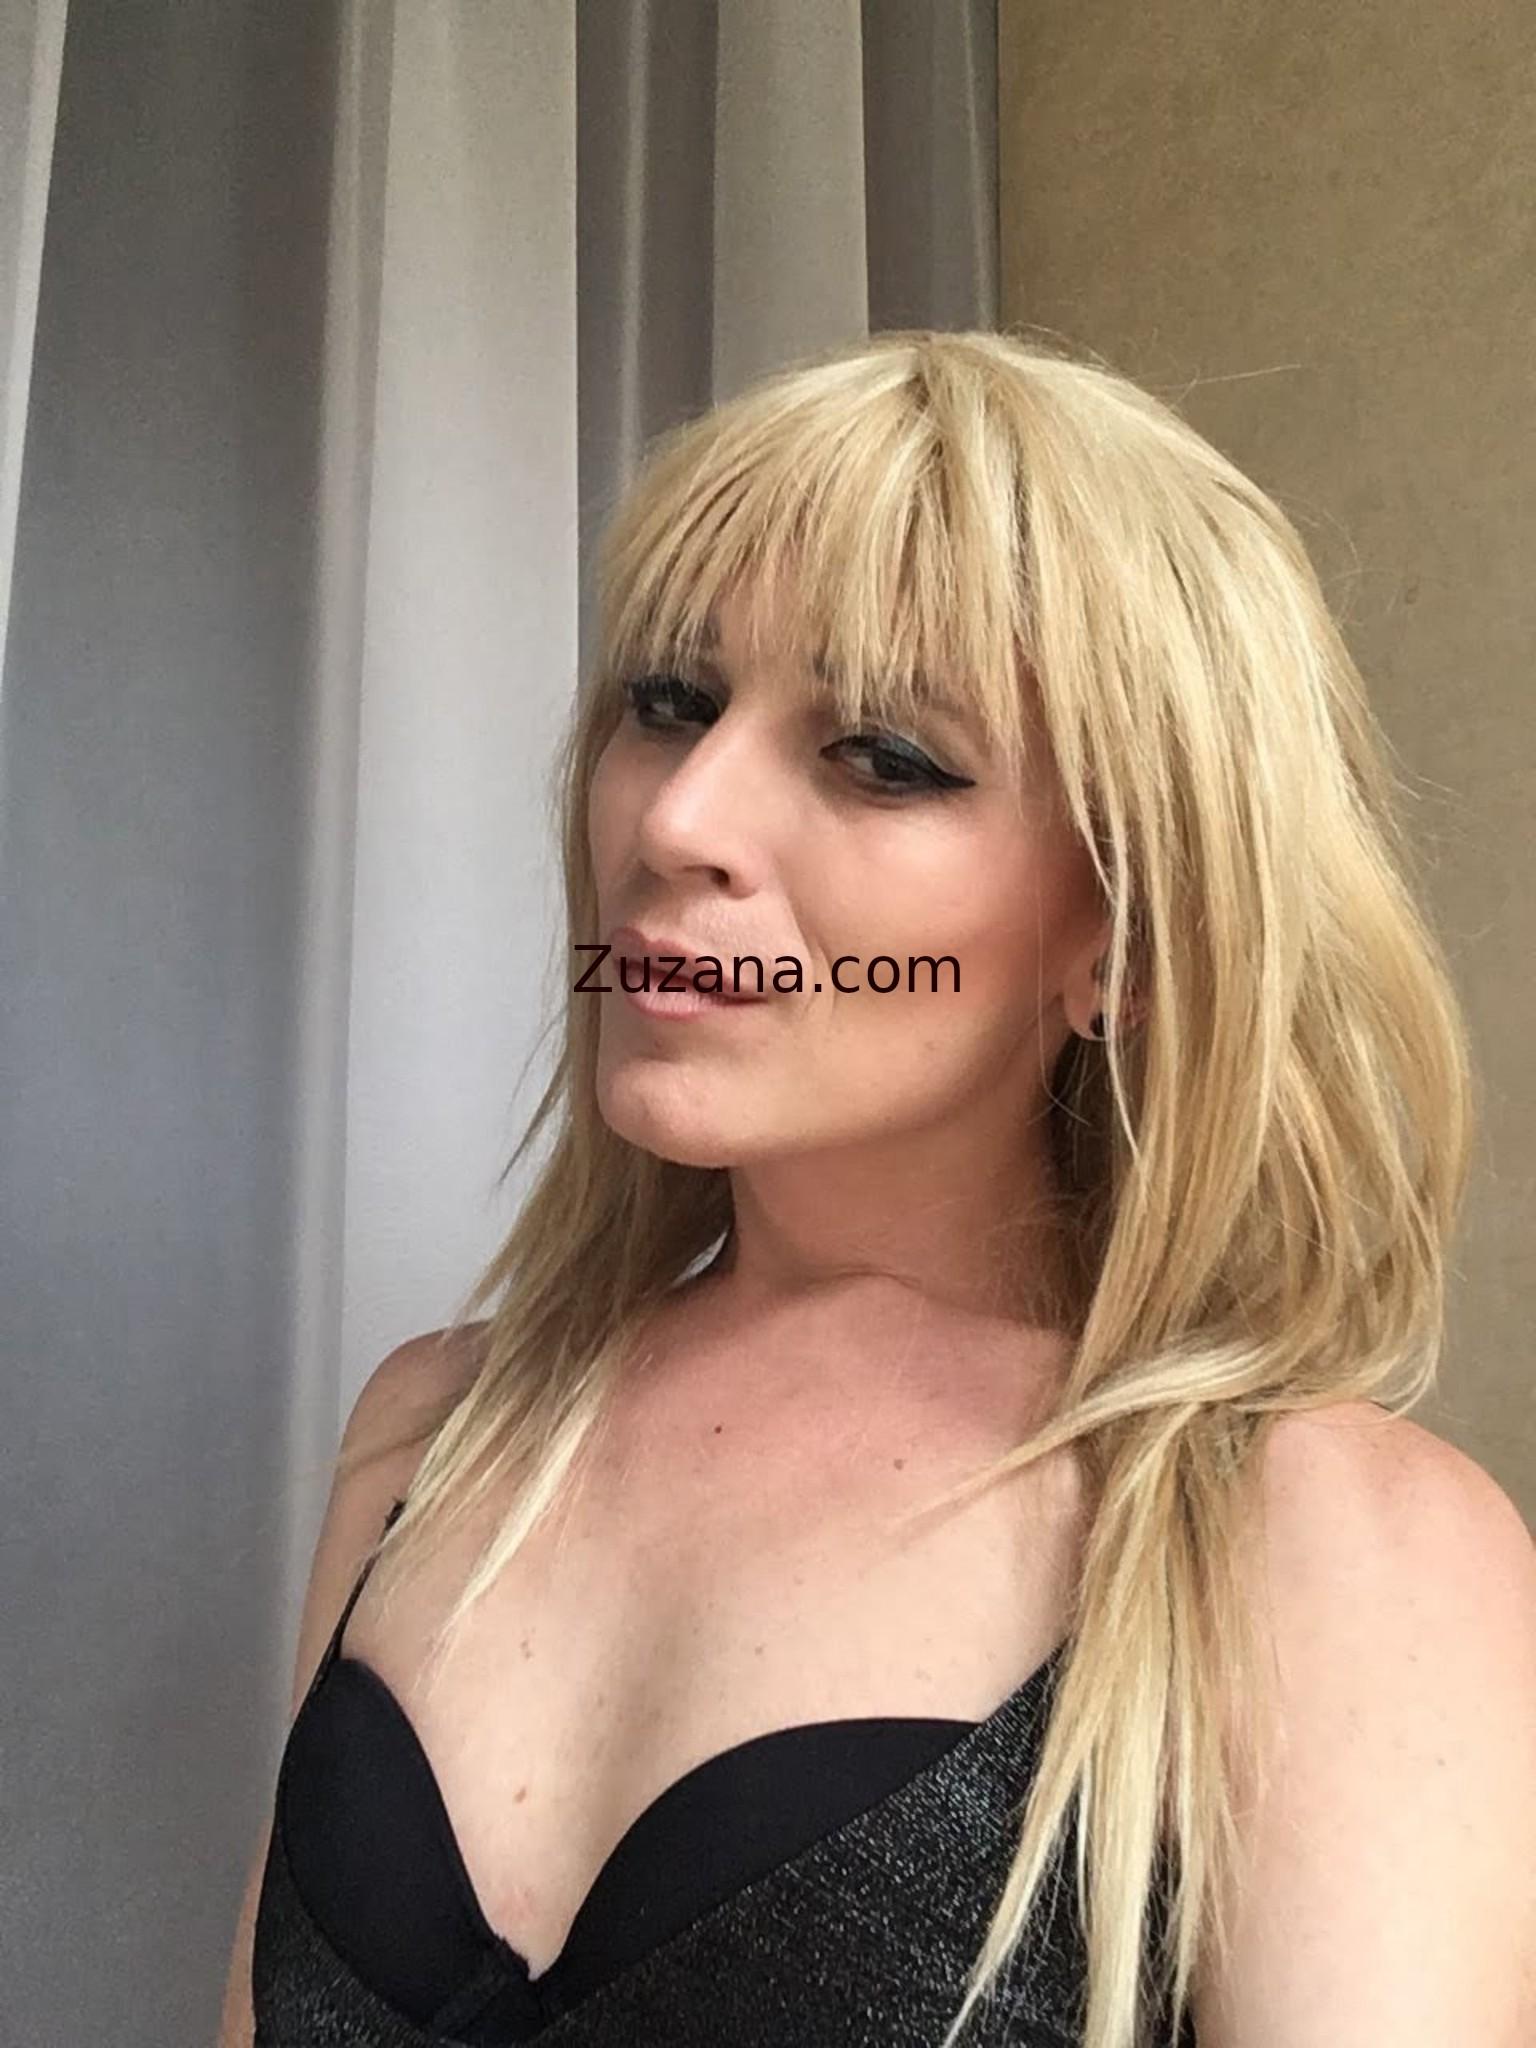 Shemale Escort Linda (27) in Odessa, Ukraine